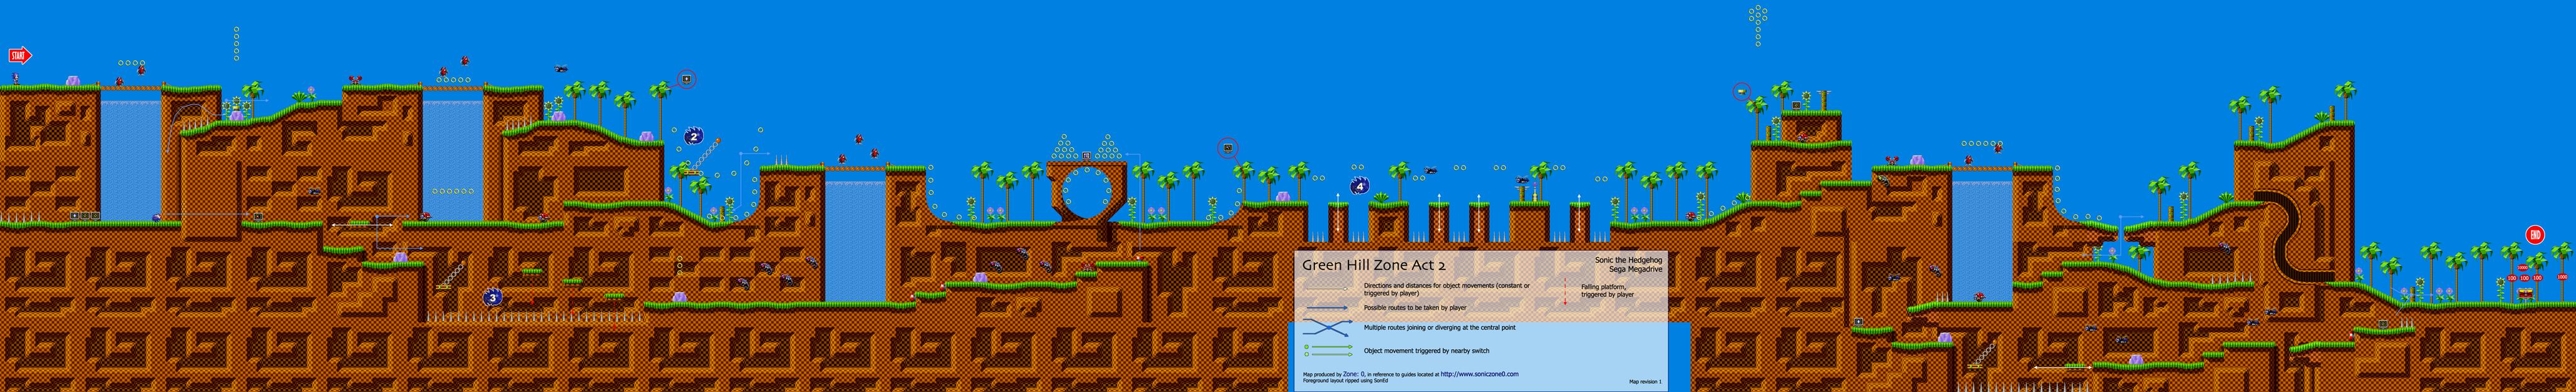 Zone 0 Sonic 1 Green Hill Zone